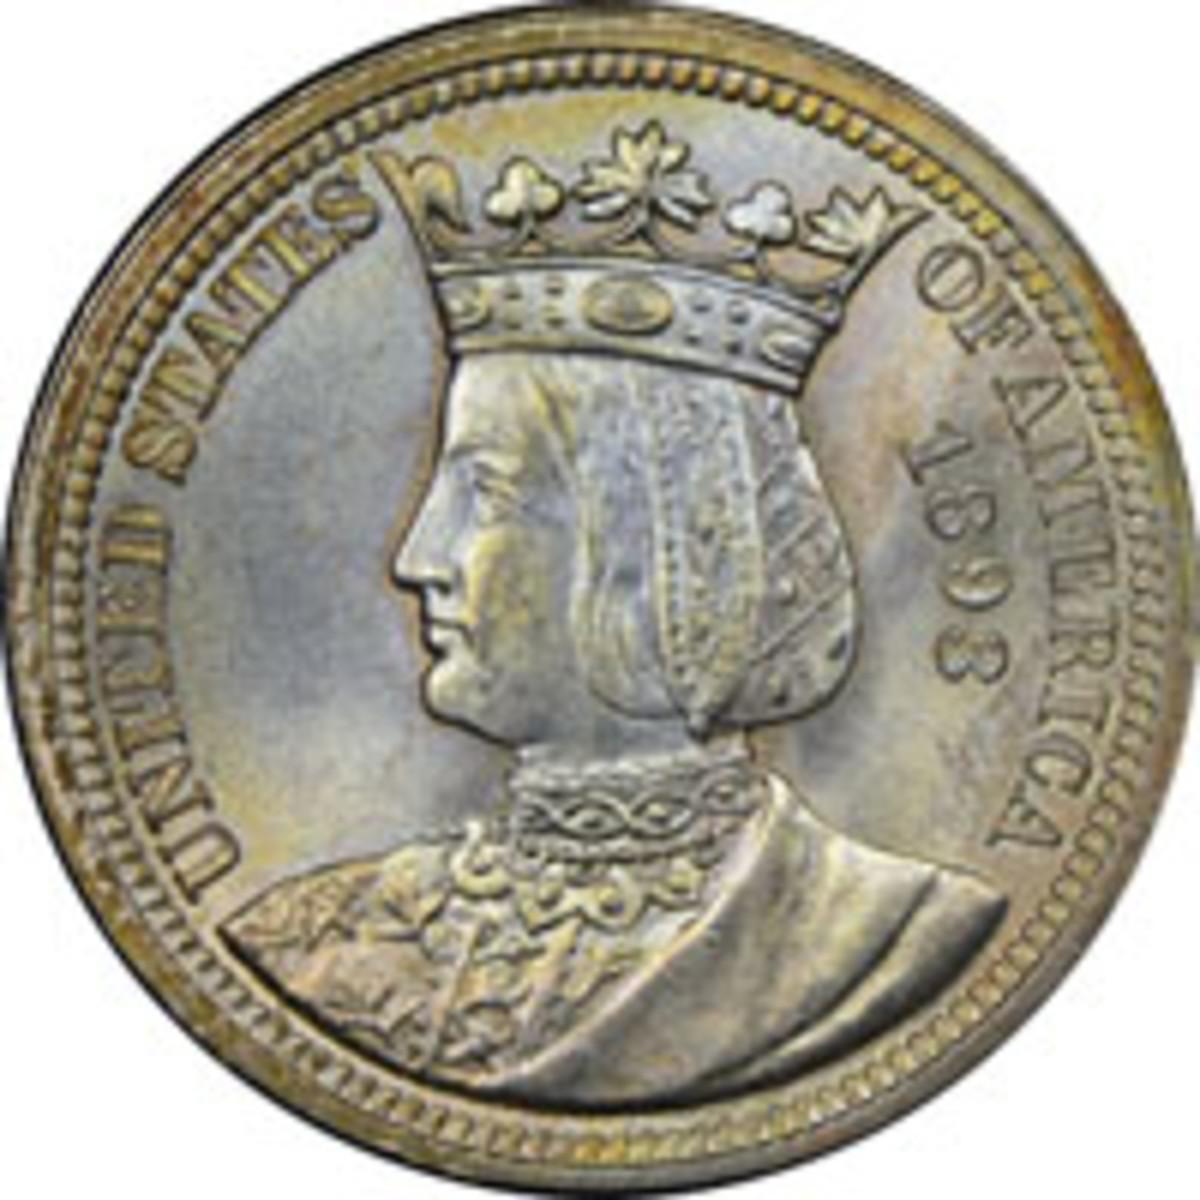 1893 Isabella commemorative quarter (Image courtesy www.ngccoin.com)